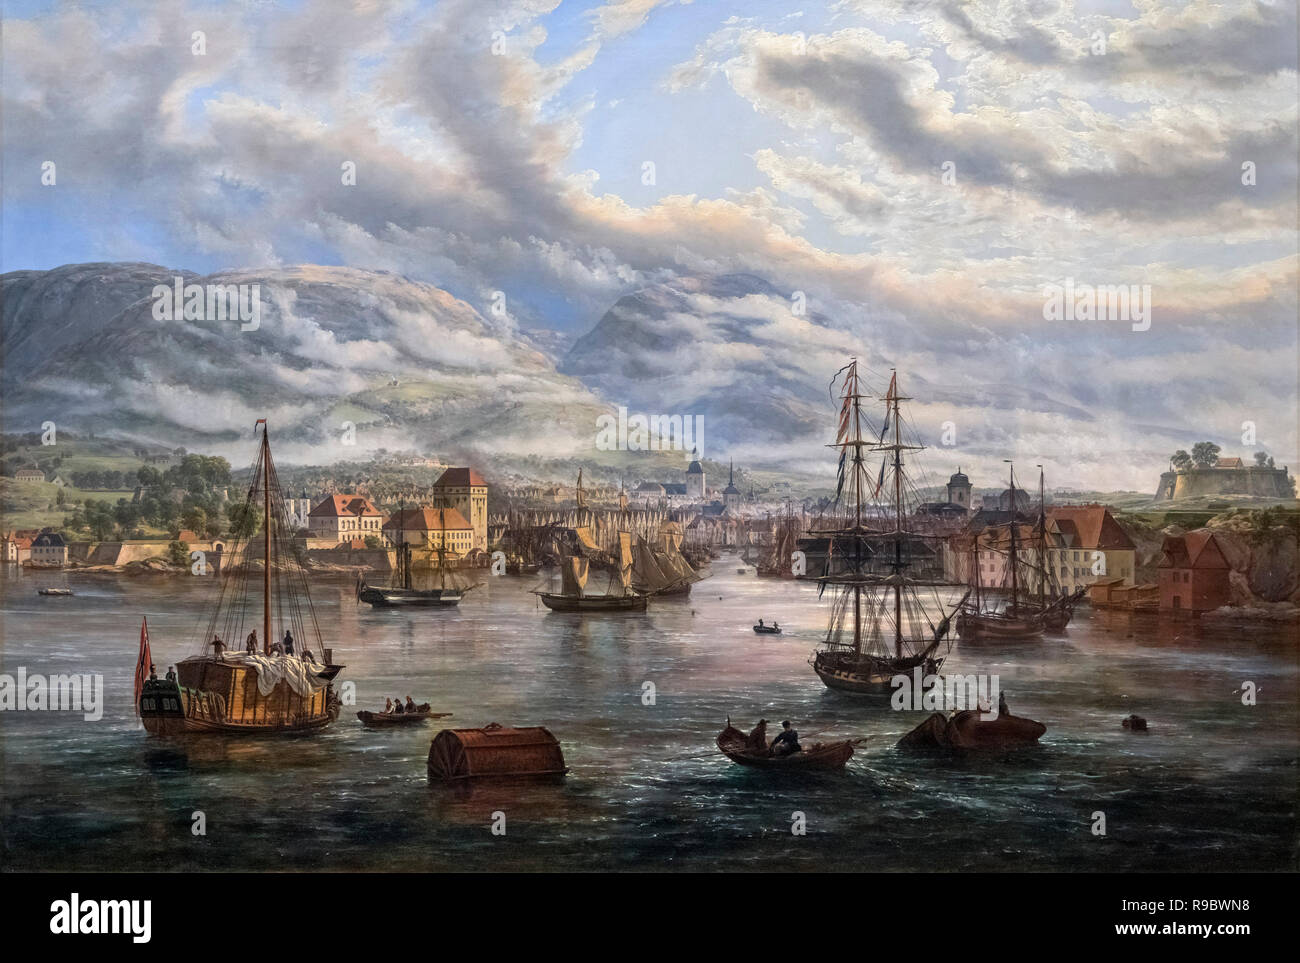 Blick auf Bergen Hafen mit J C Dahl (Johan Christian Dahl Claussen: 1788-1857), Öl auf Leinwand, 1834 Stockbild